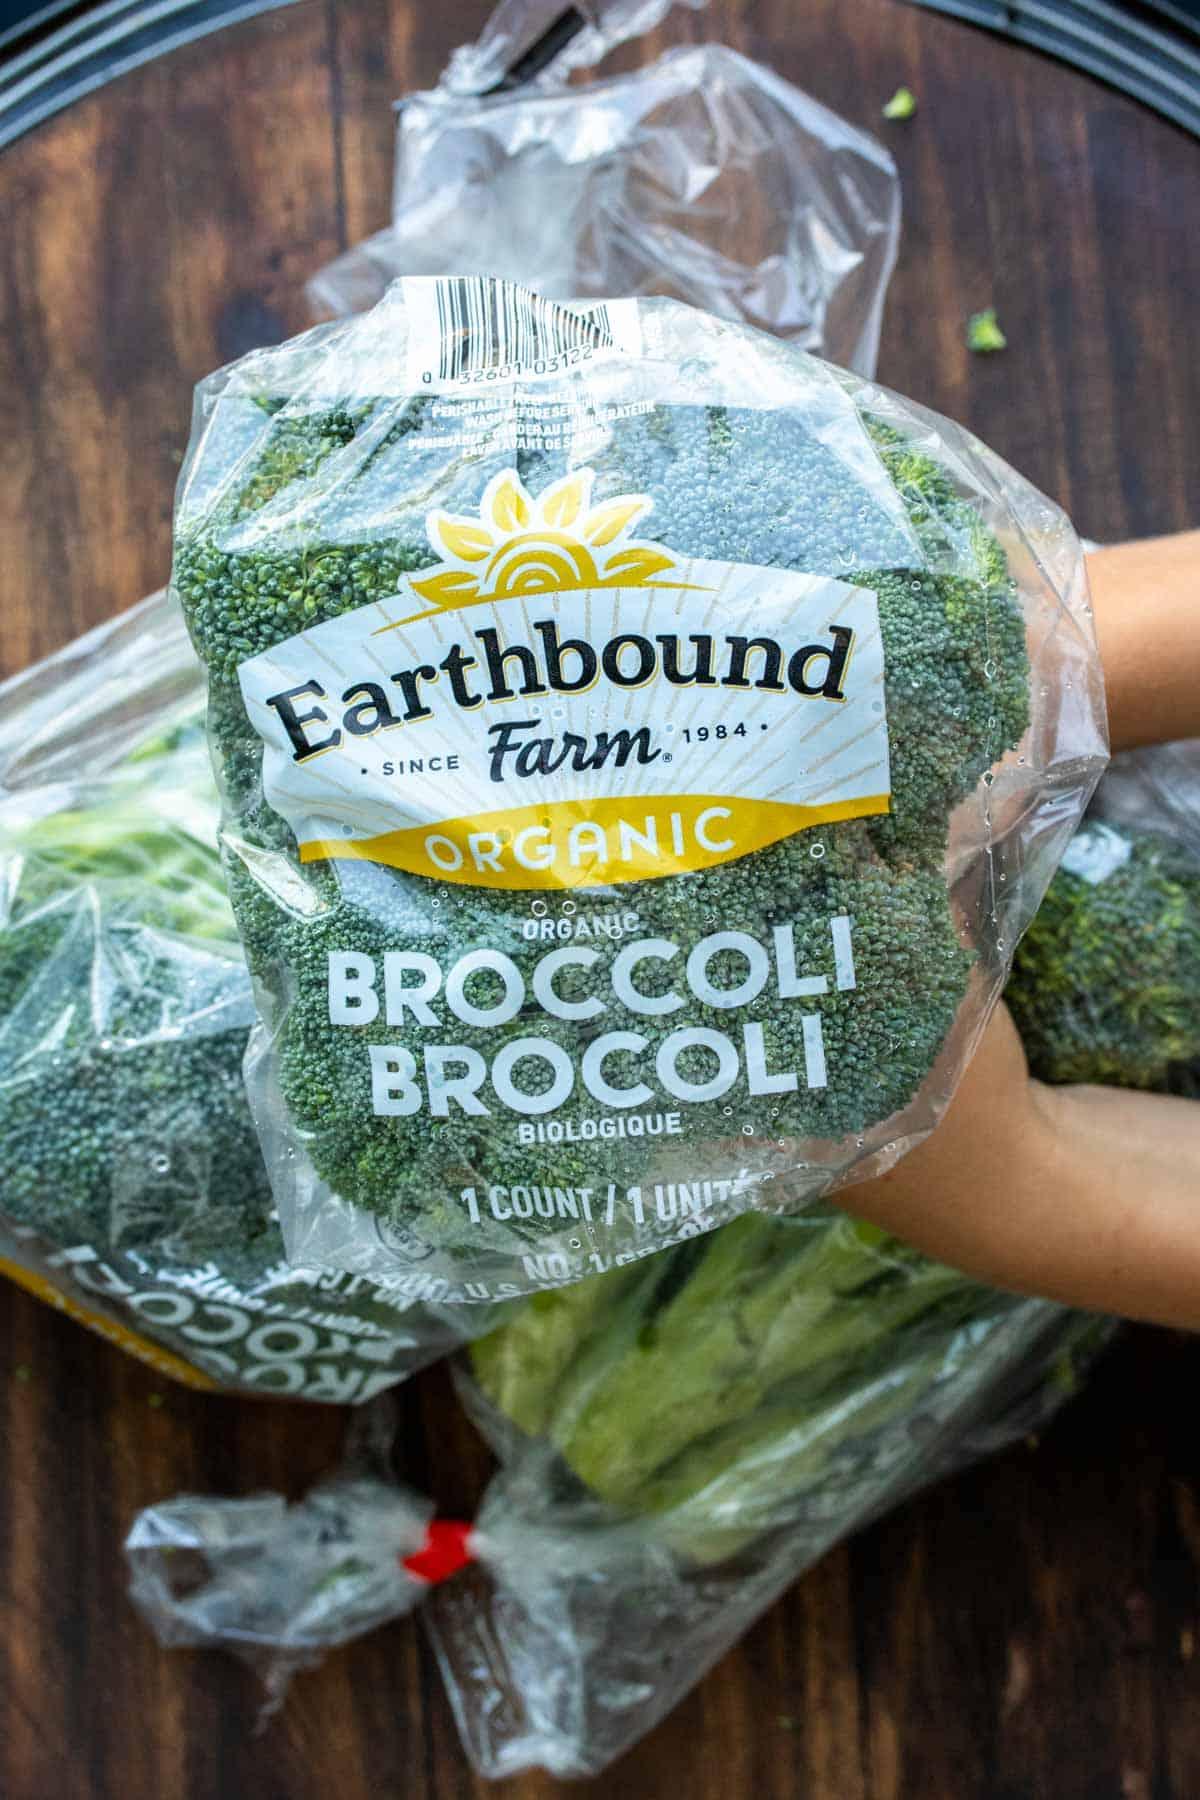 Hands holding a stalk of Earthbound Farm Arganic broccoli